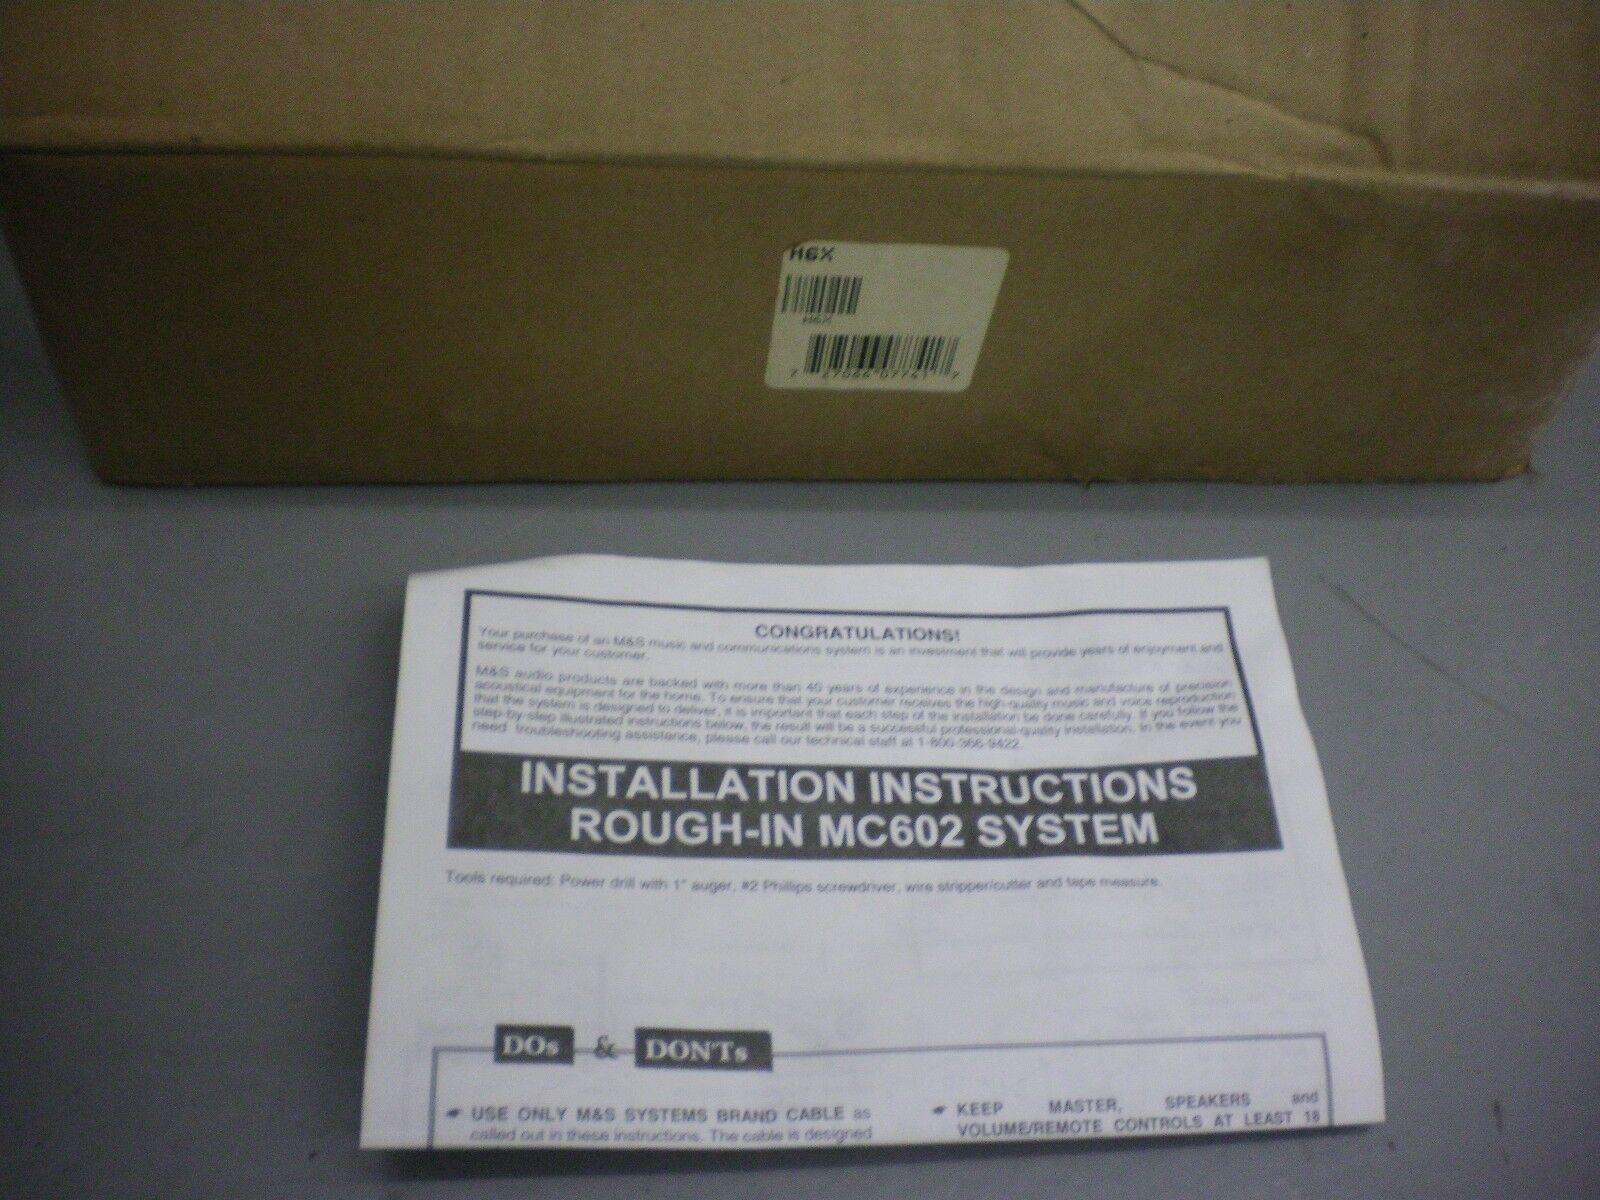 M & S Systems H6X Rough-in Box w/Transformer for MC602 Intercom System